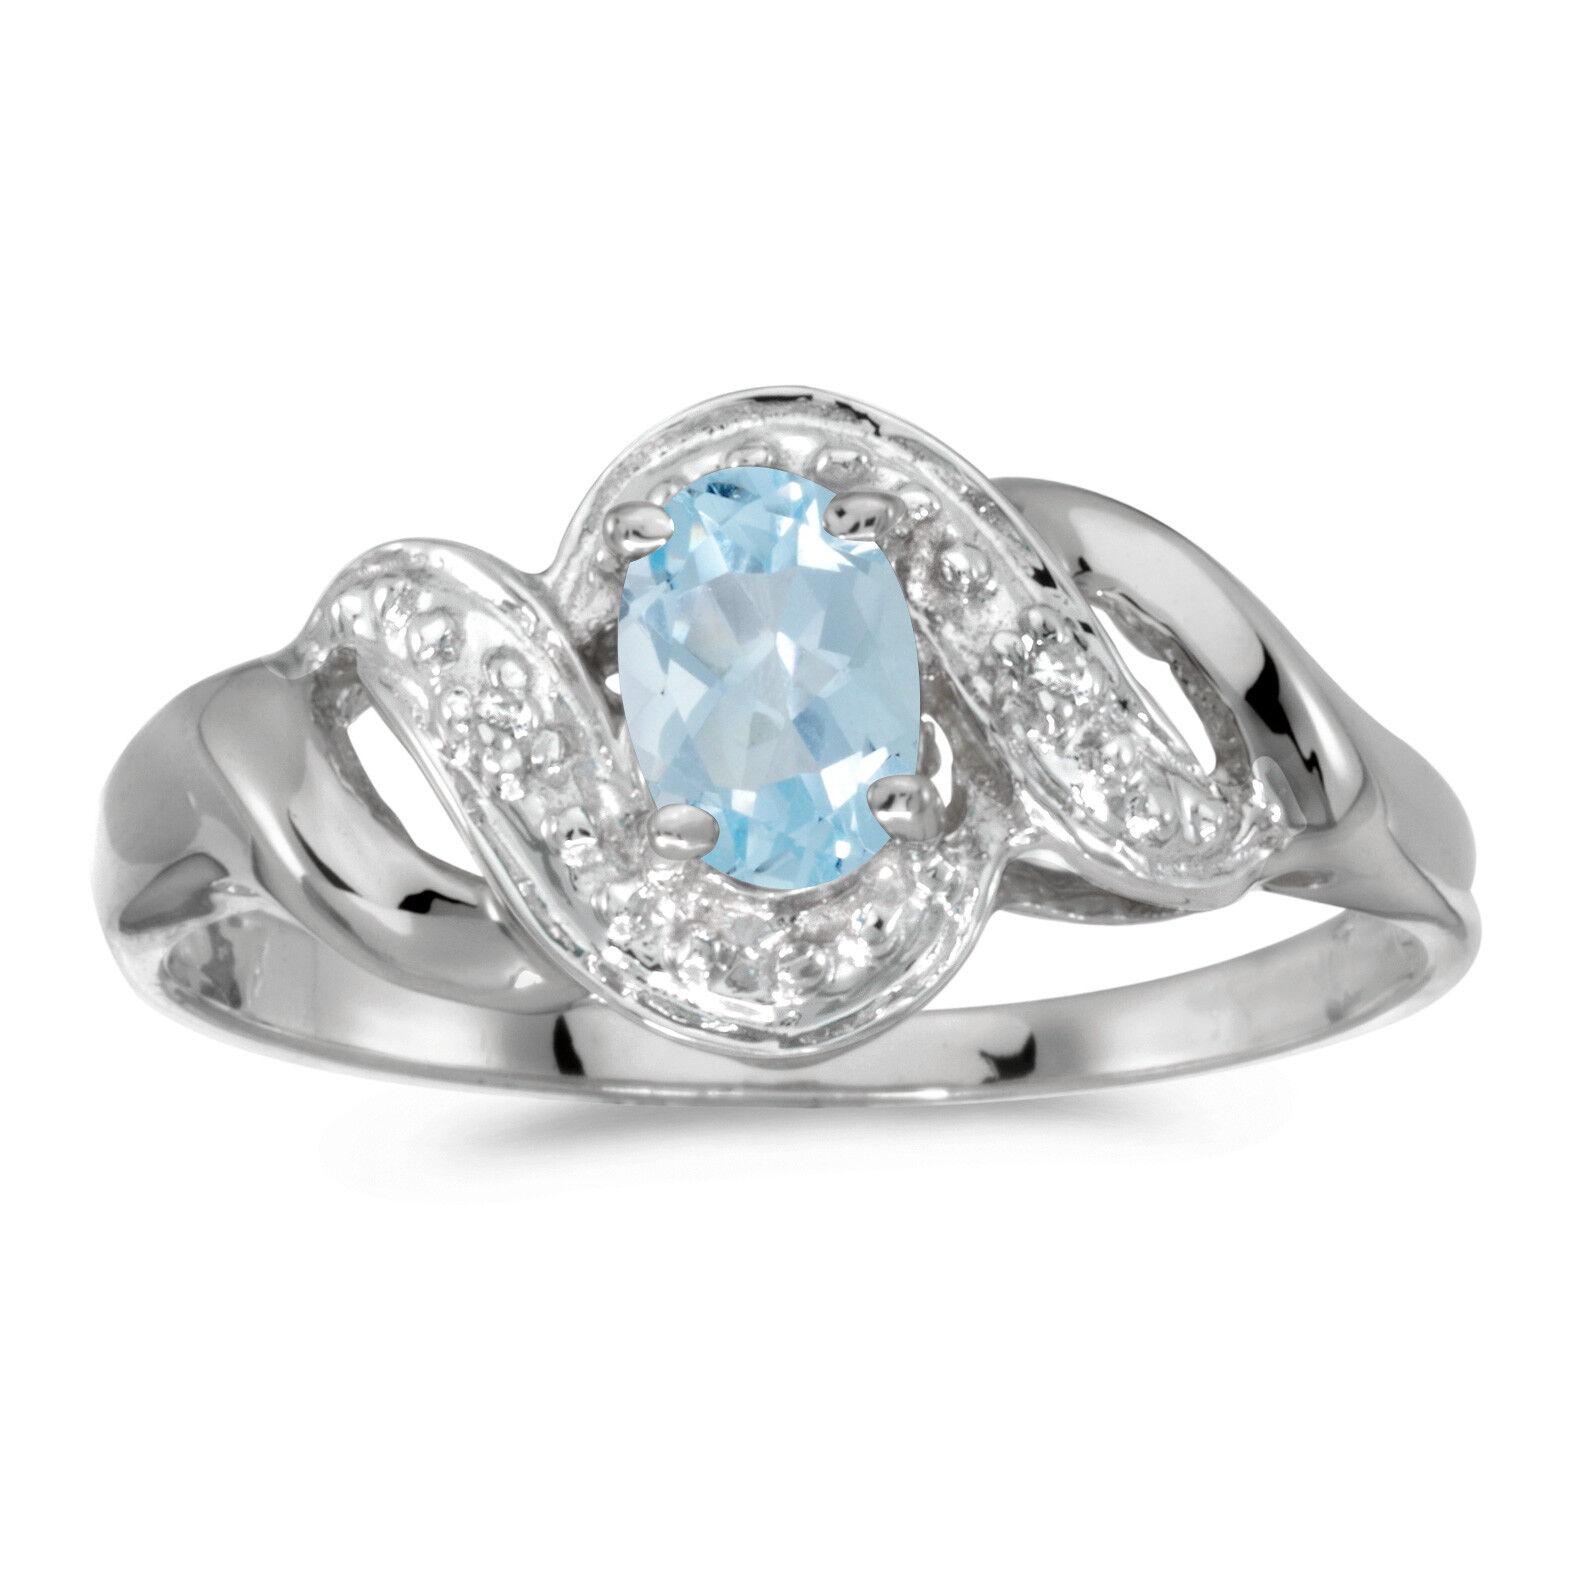 10k White gold Oval Aquamarine And Diamond Swirl Ring